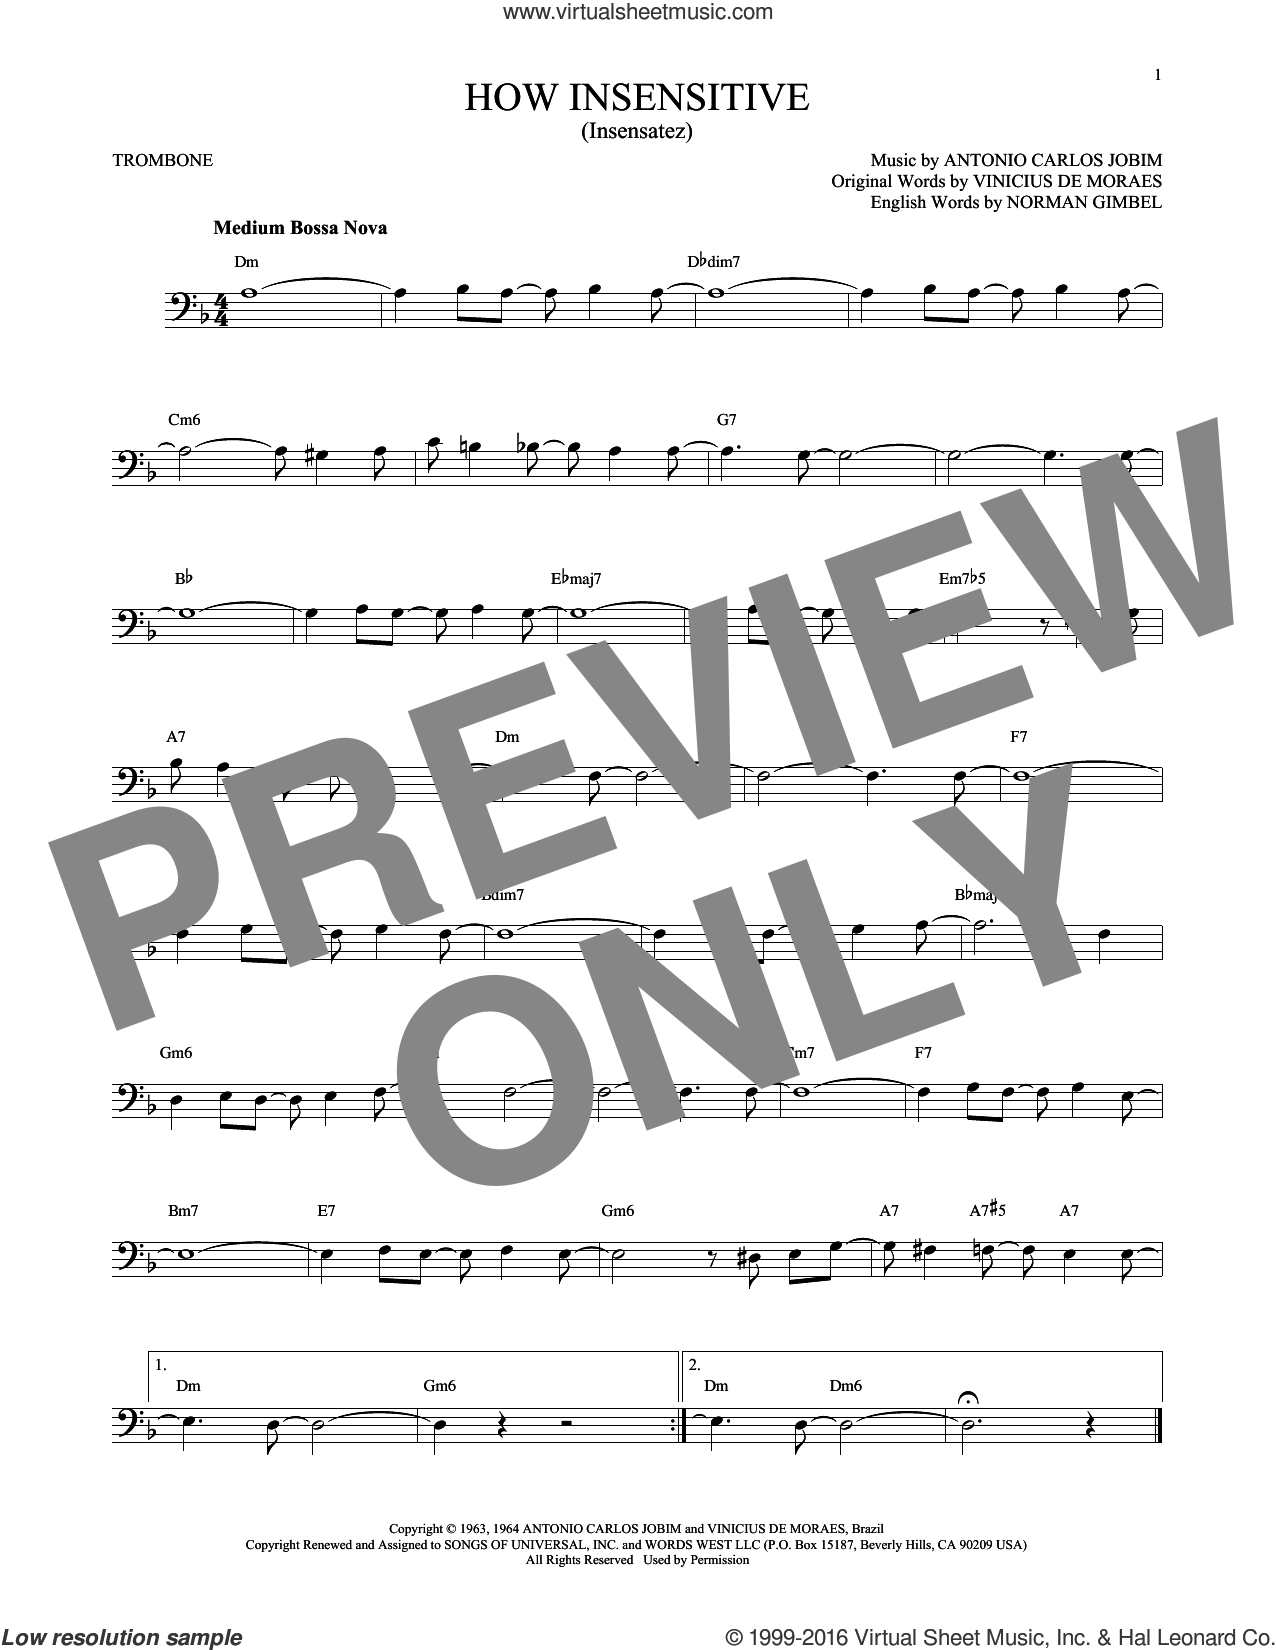 How Insensitive (Insensatez) sheet music for trombone solo by Norman Gimbel, Astrud Gilberto, Antonio Carlos Jobim and Vinicius de Moraes, intermediate skill level